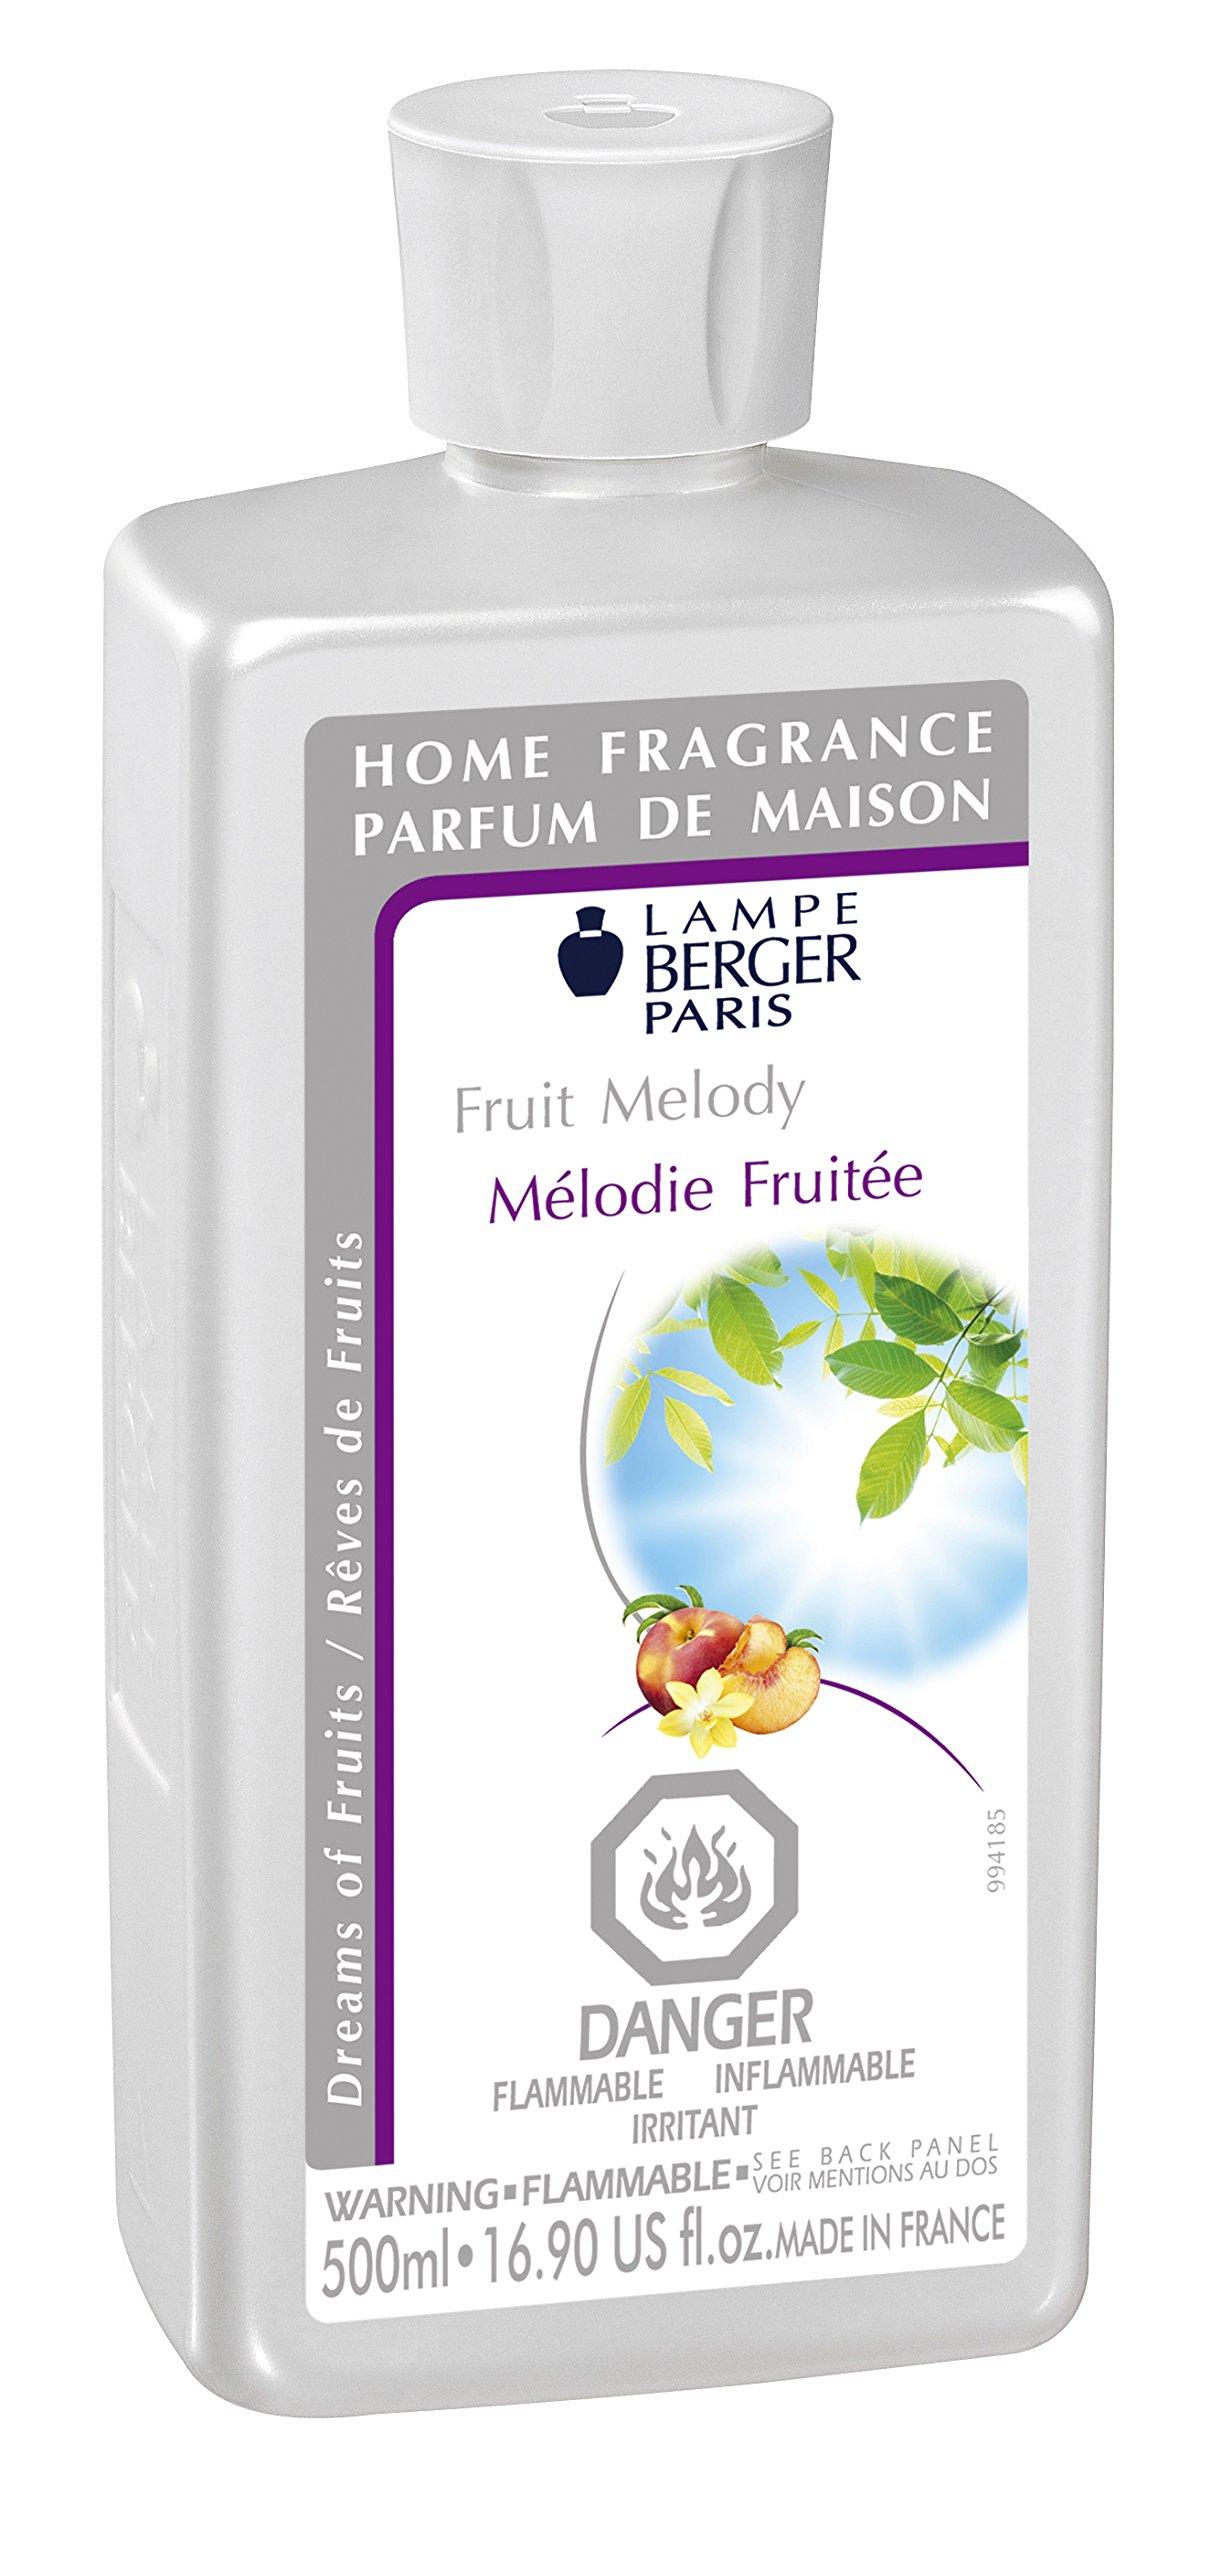 Lampe Berger Fragrance - Fruit Melody , 500ml / 16.9 fl.oz.